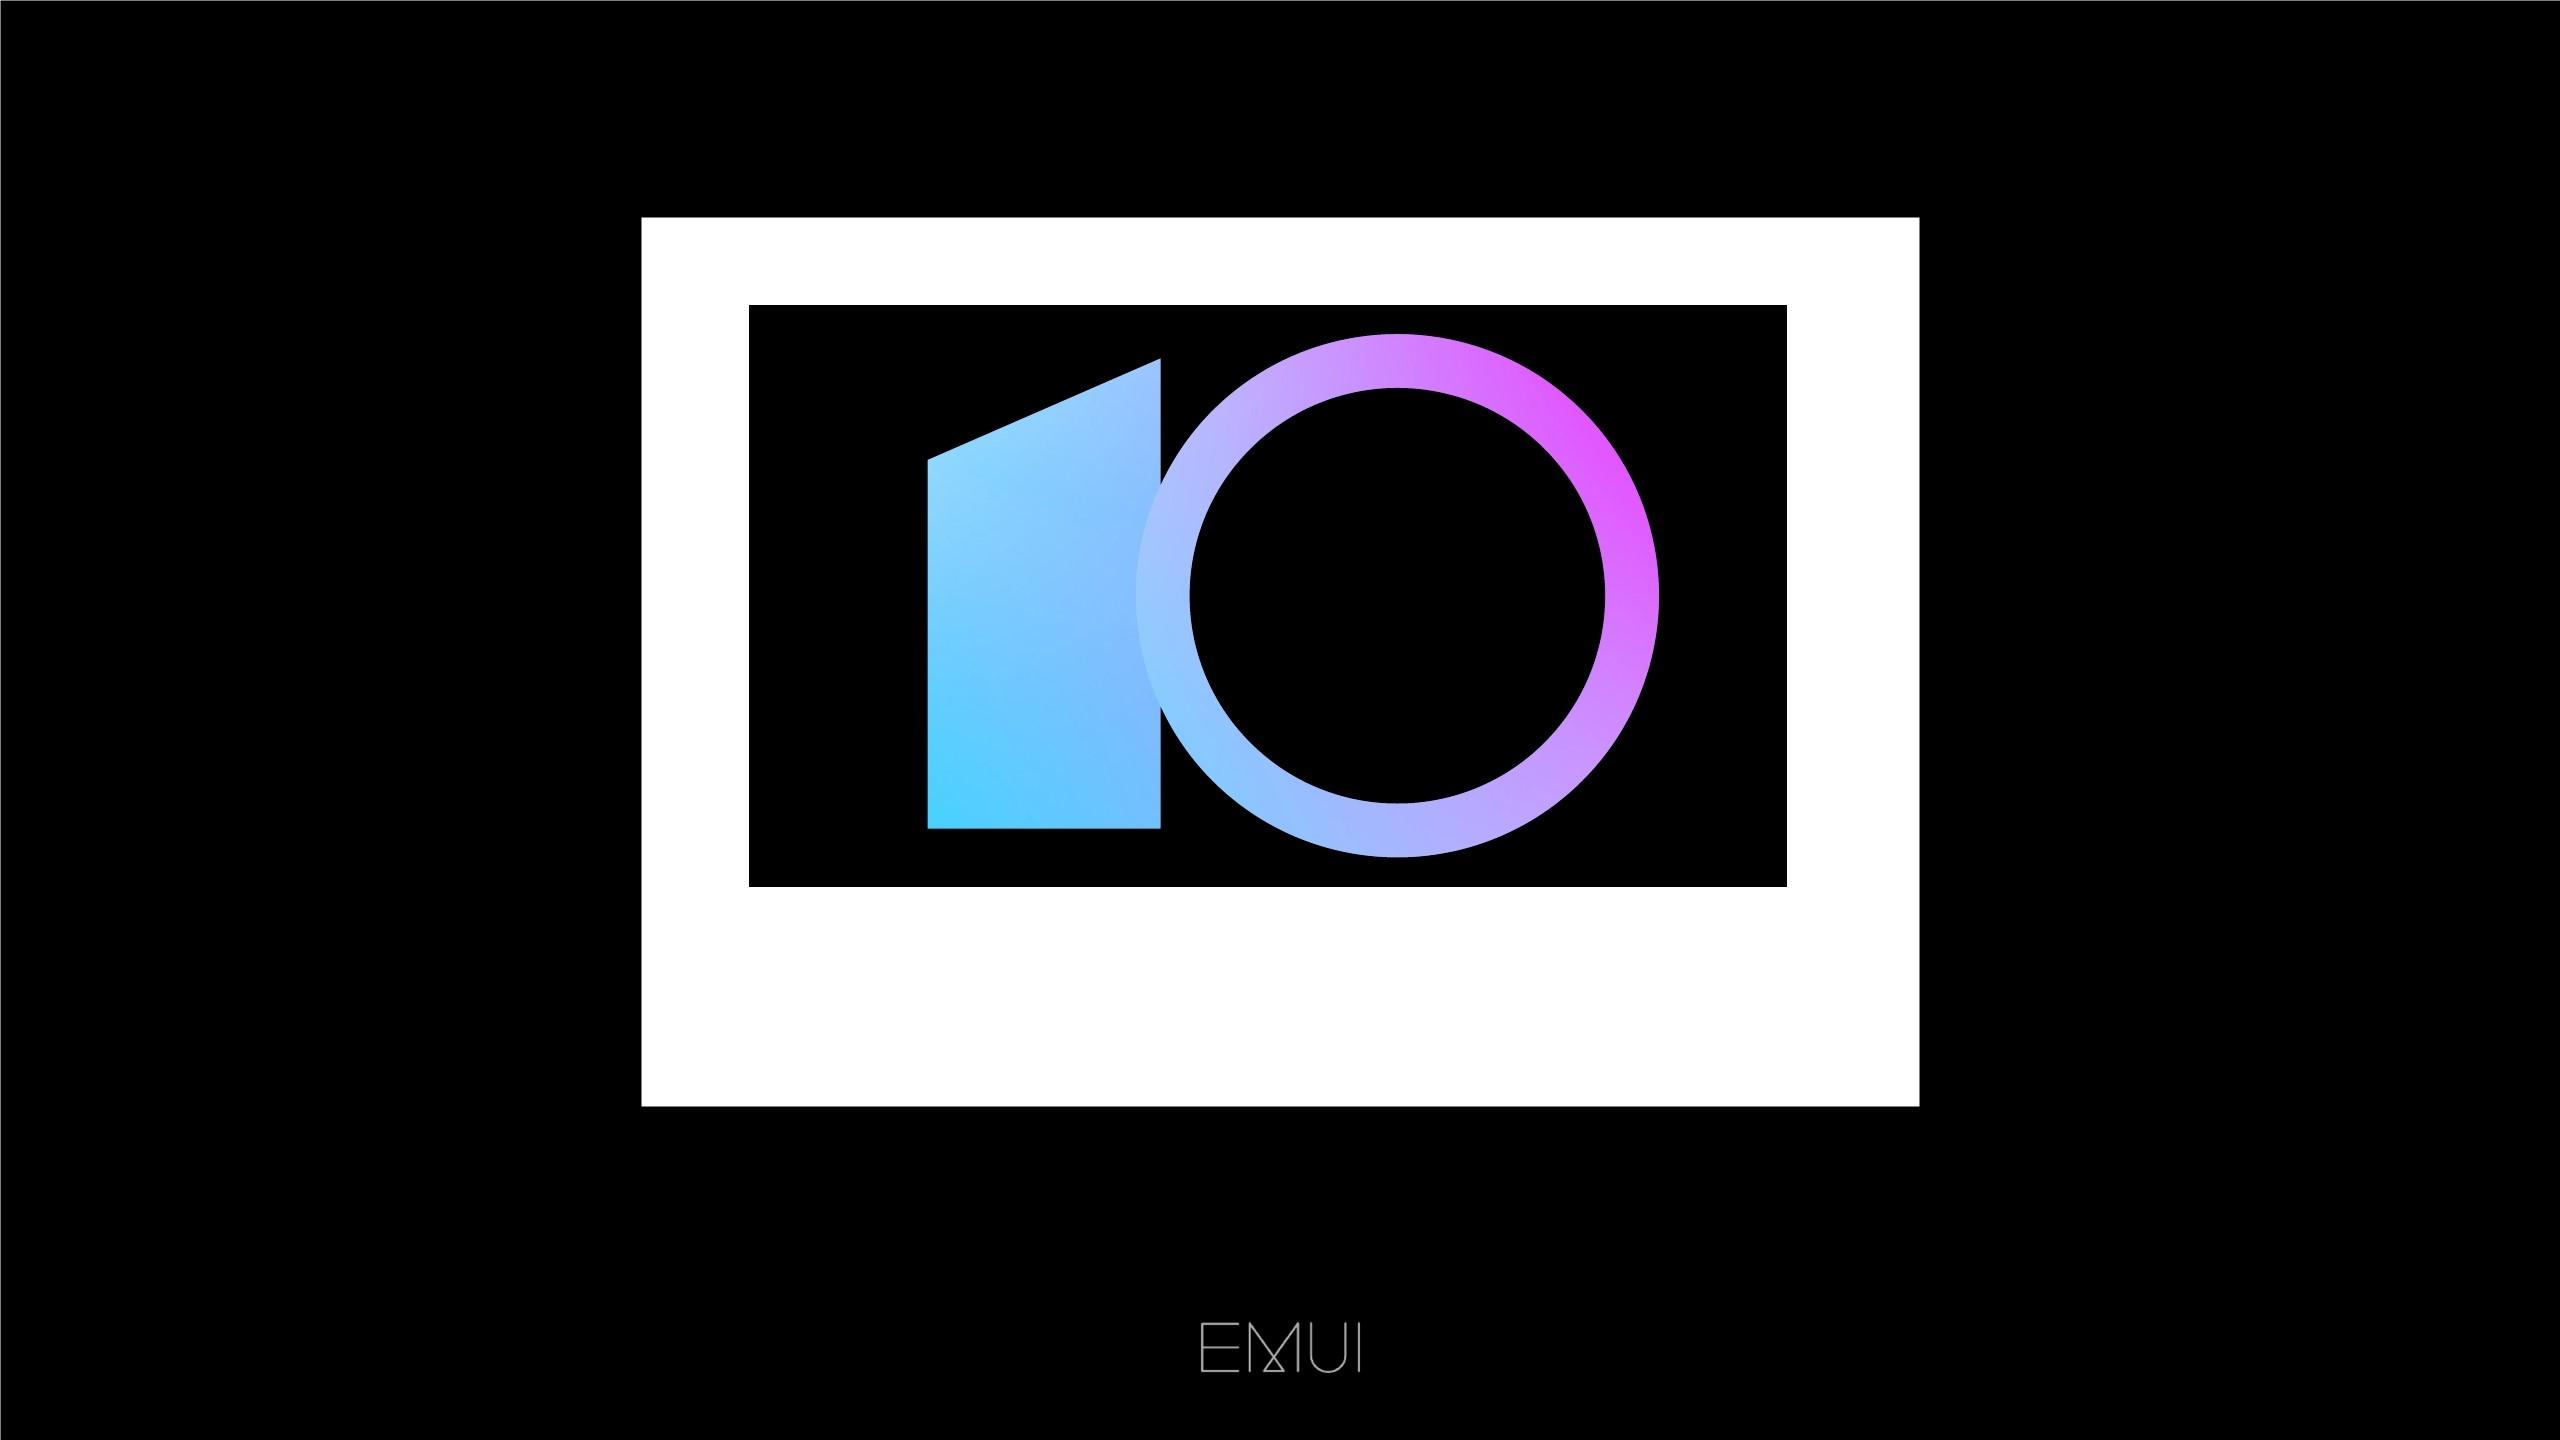 华为EMUI10设计中的AI和美学